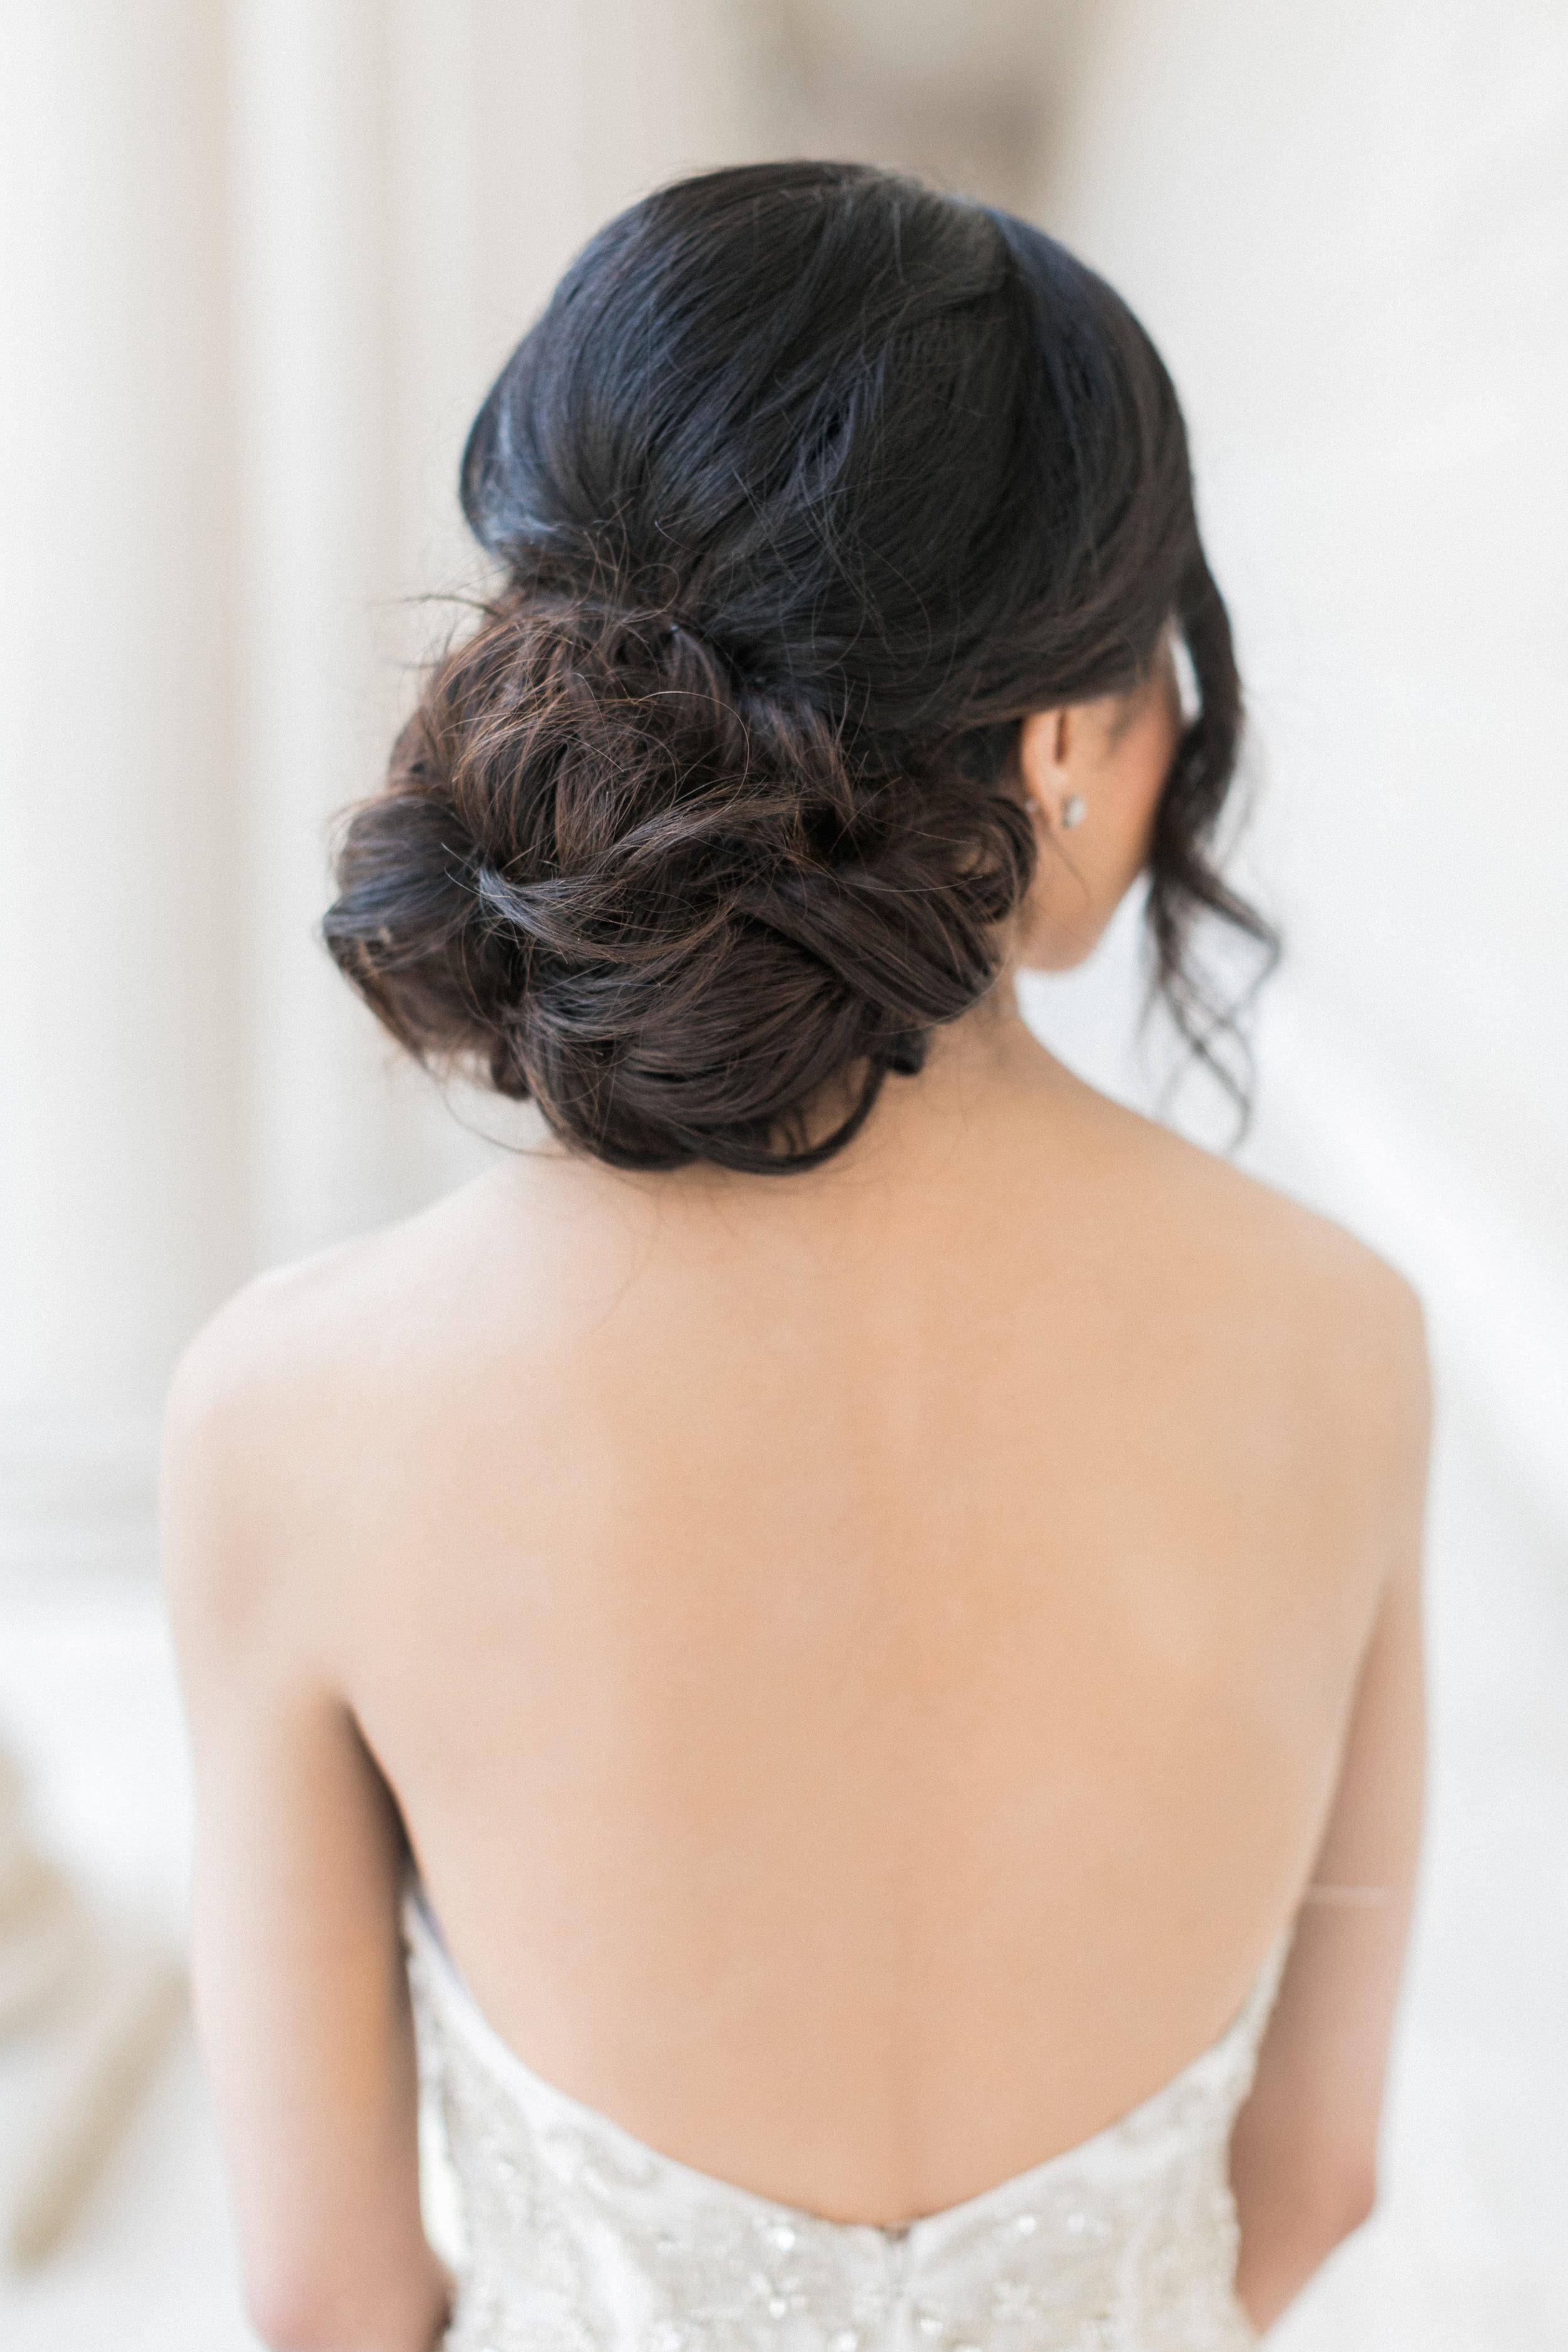 maria-lee-wedding-makeup-hair-sf-scar-cover_karen.jpg